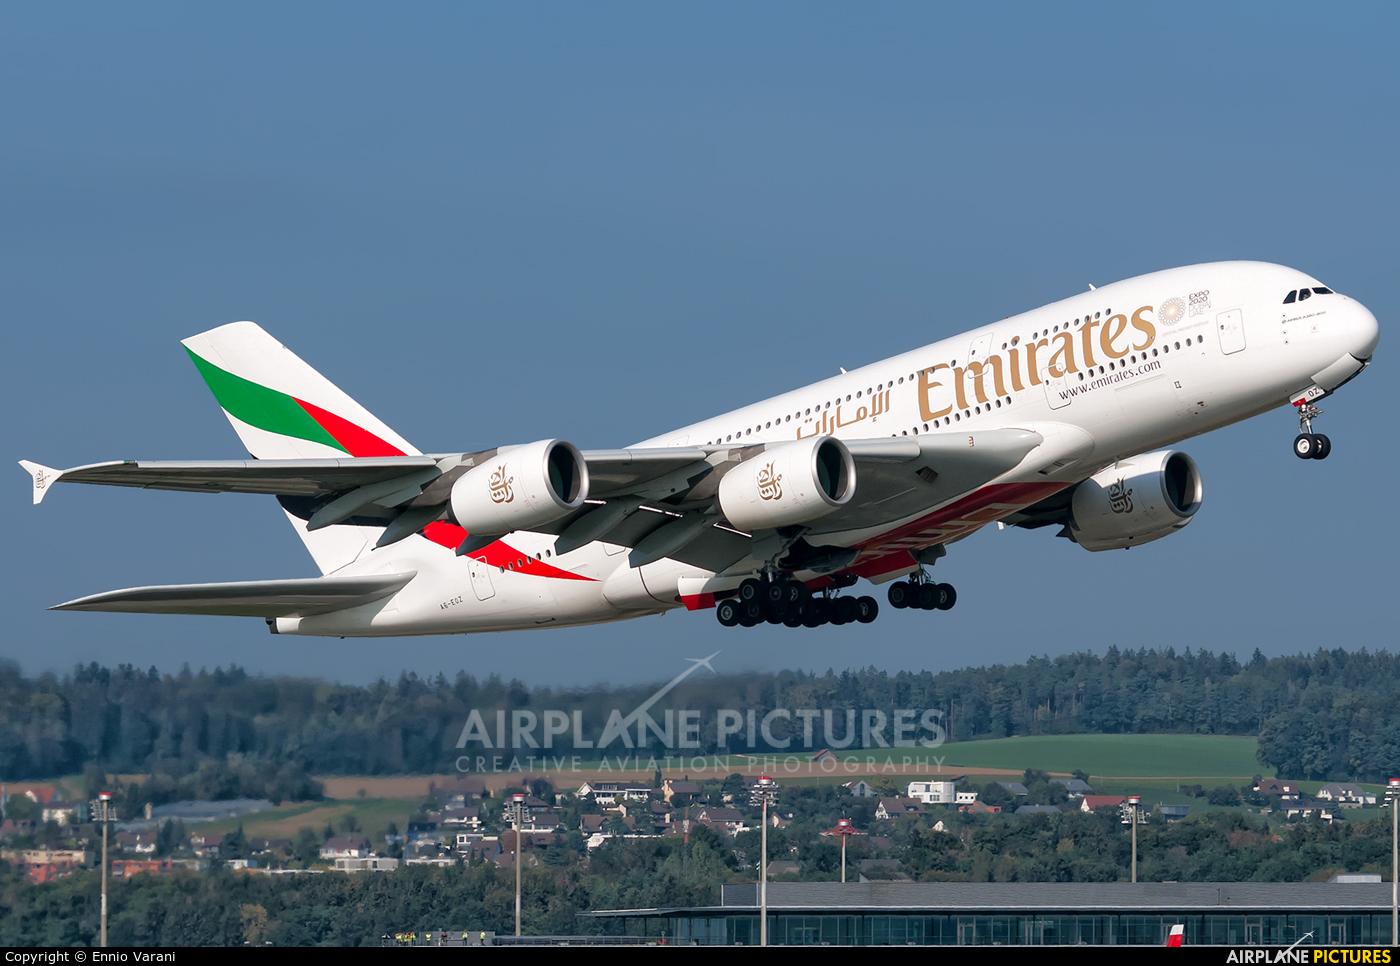 Emirates Airlines A6-EOZ aircraft at Zurich